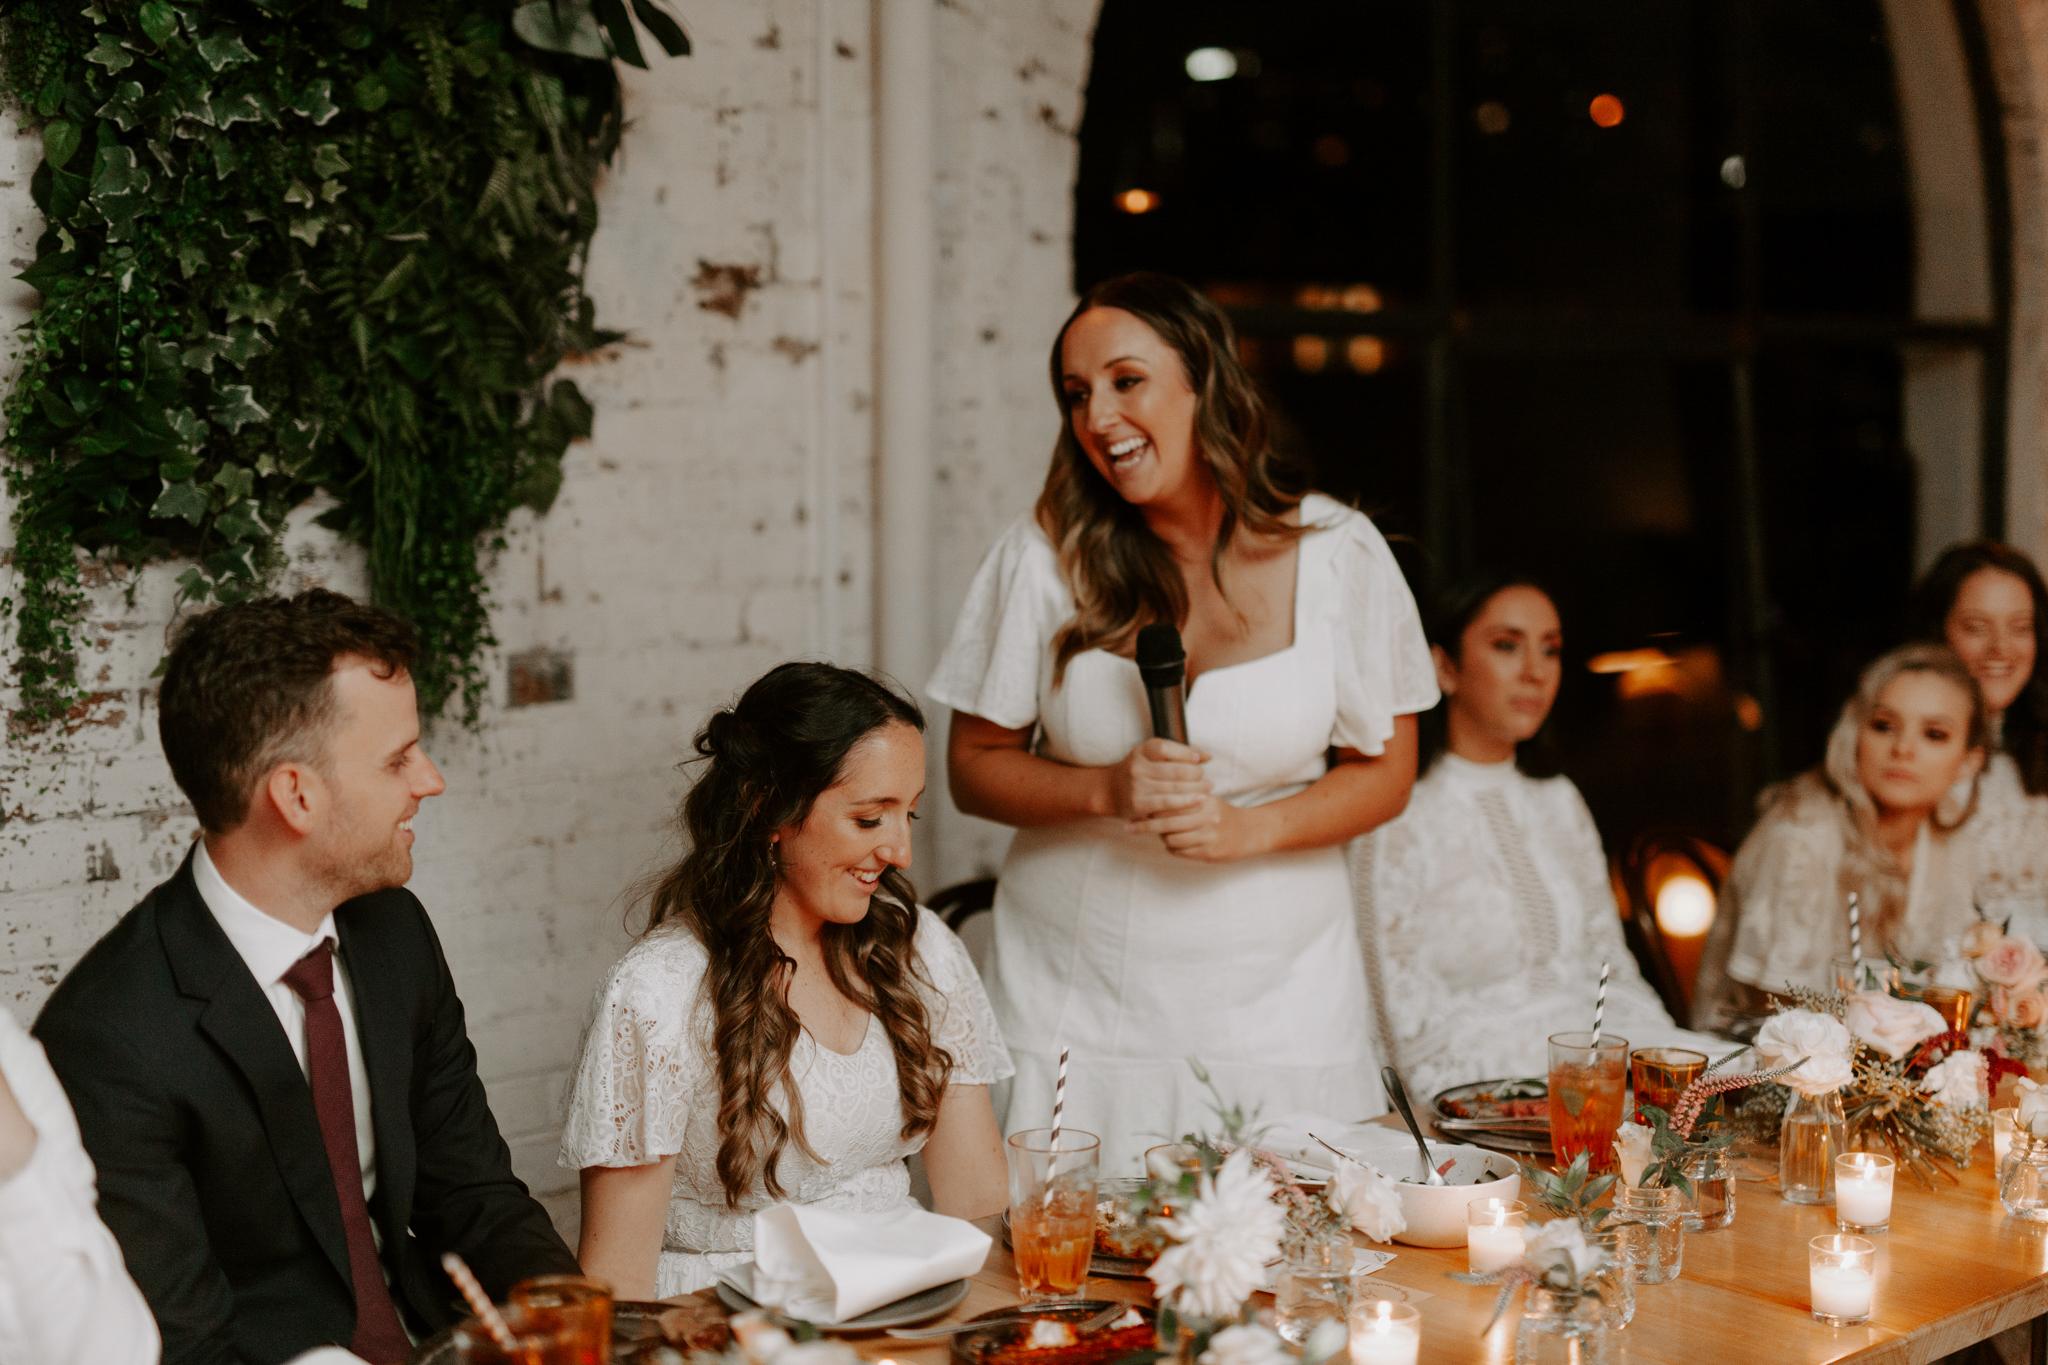 Panama-Dining-Room-wedding-emotionsandmath-043.jpg